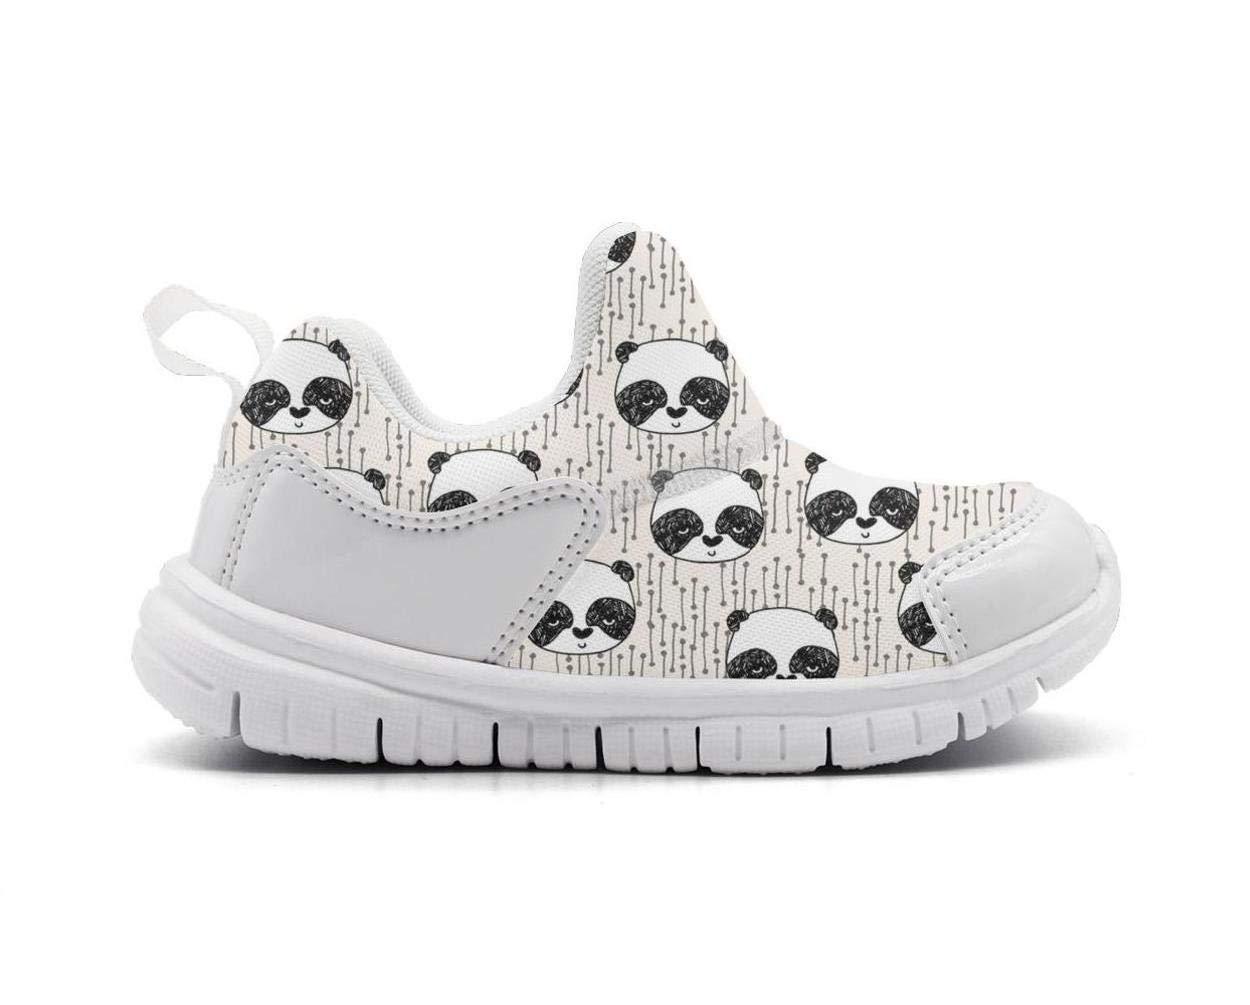 ONEYUAN Children Japan Kawaii Panda Bear Kid Casual Lightweight Sport Shoes Sneakers Walking Athletic Shoes